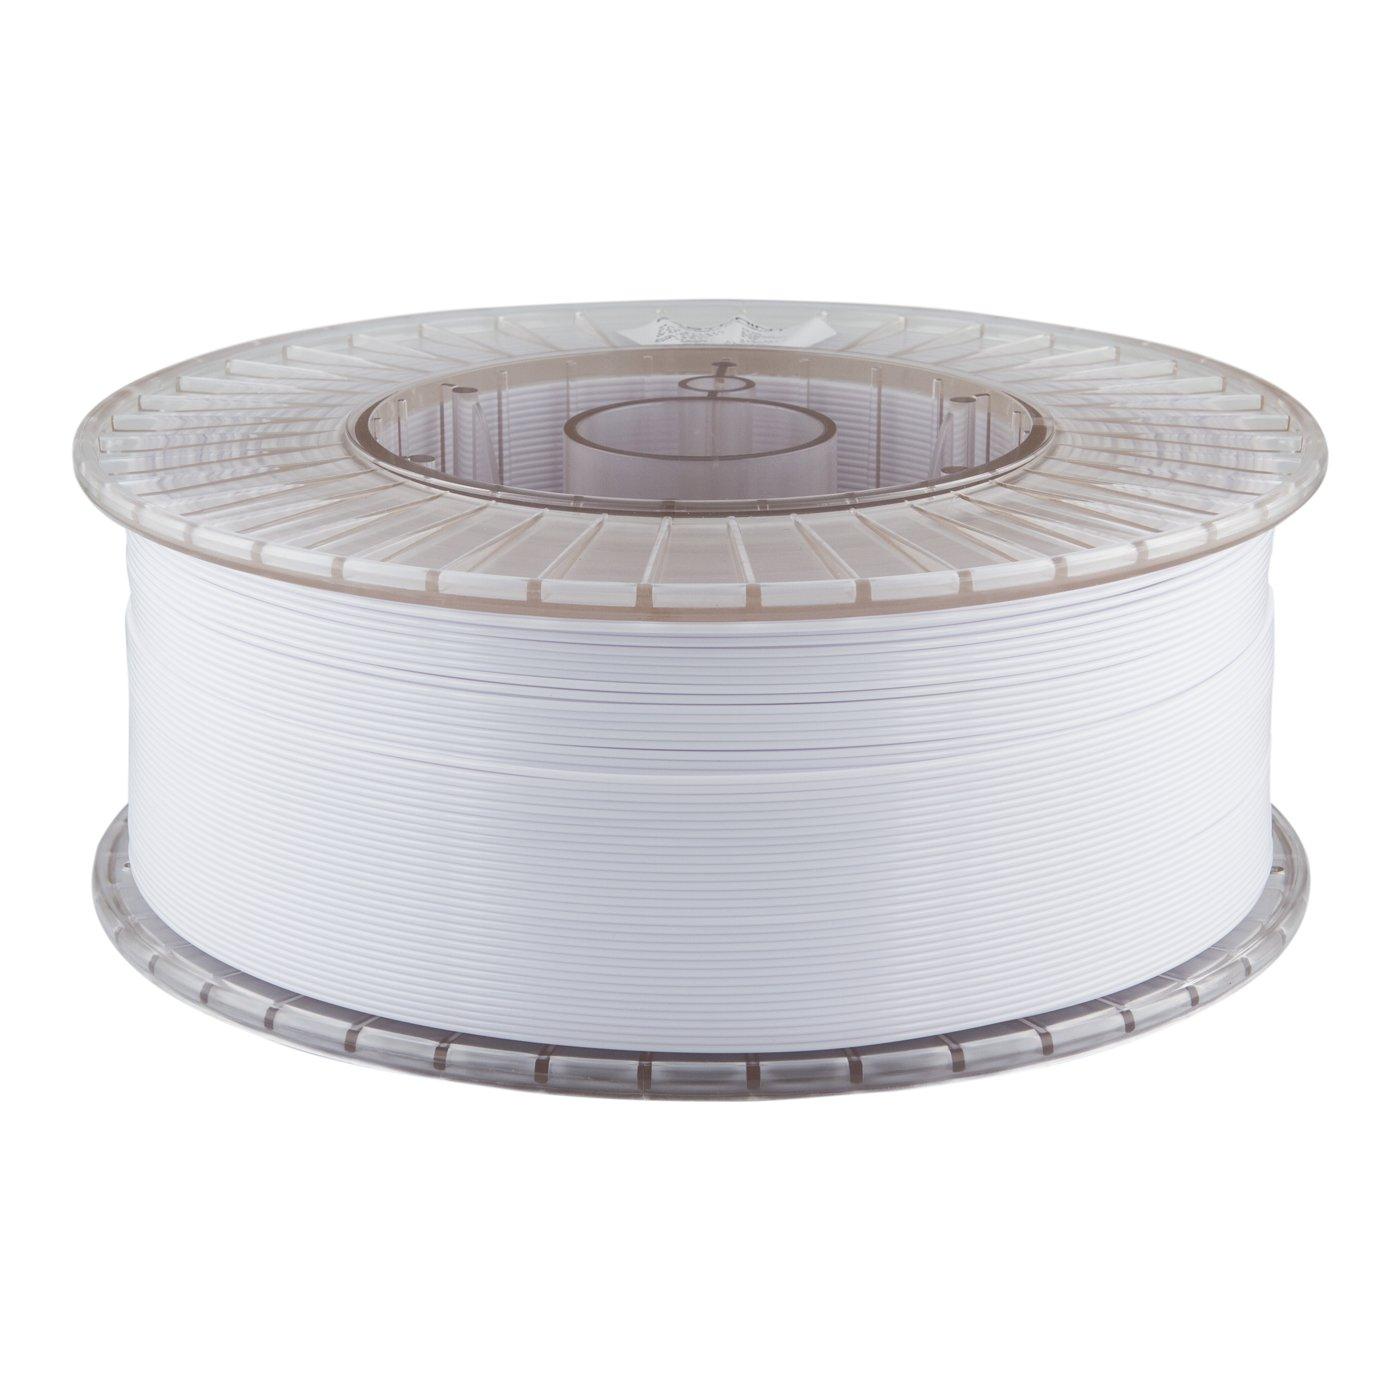 Premium Filament In Reinem Weiß 2.85-1000 Gr 3d Printer Consumables Easyprint Pla Computers/tablets & Networking